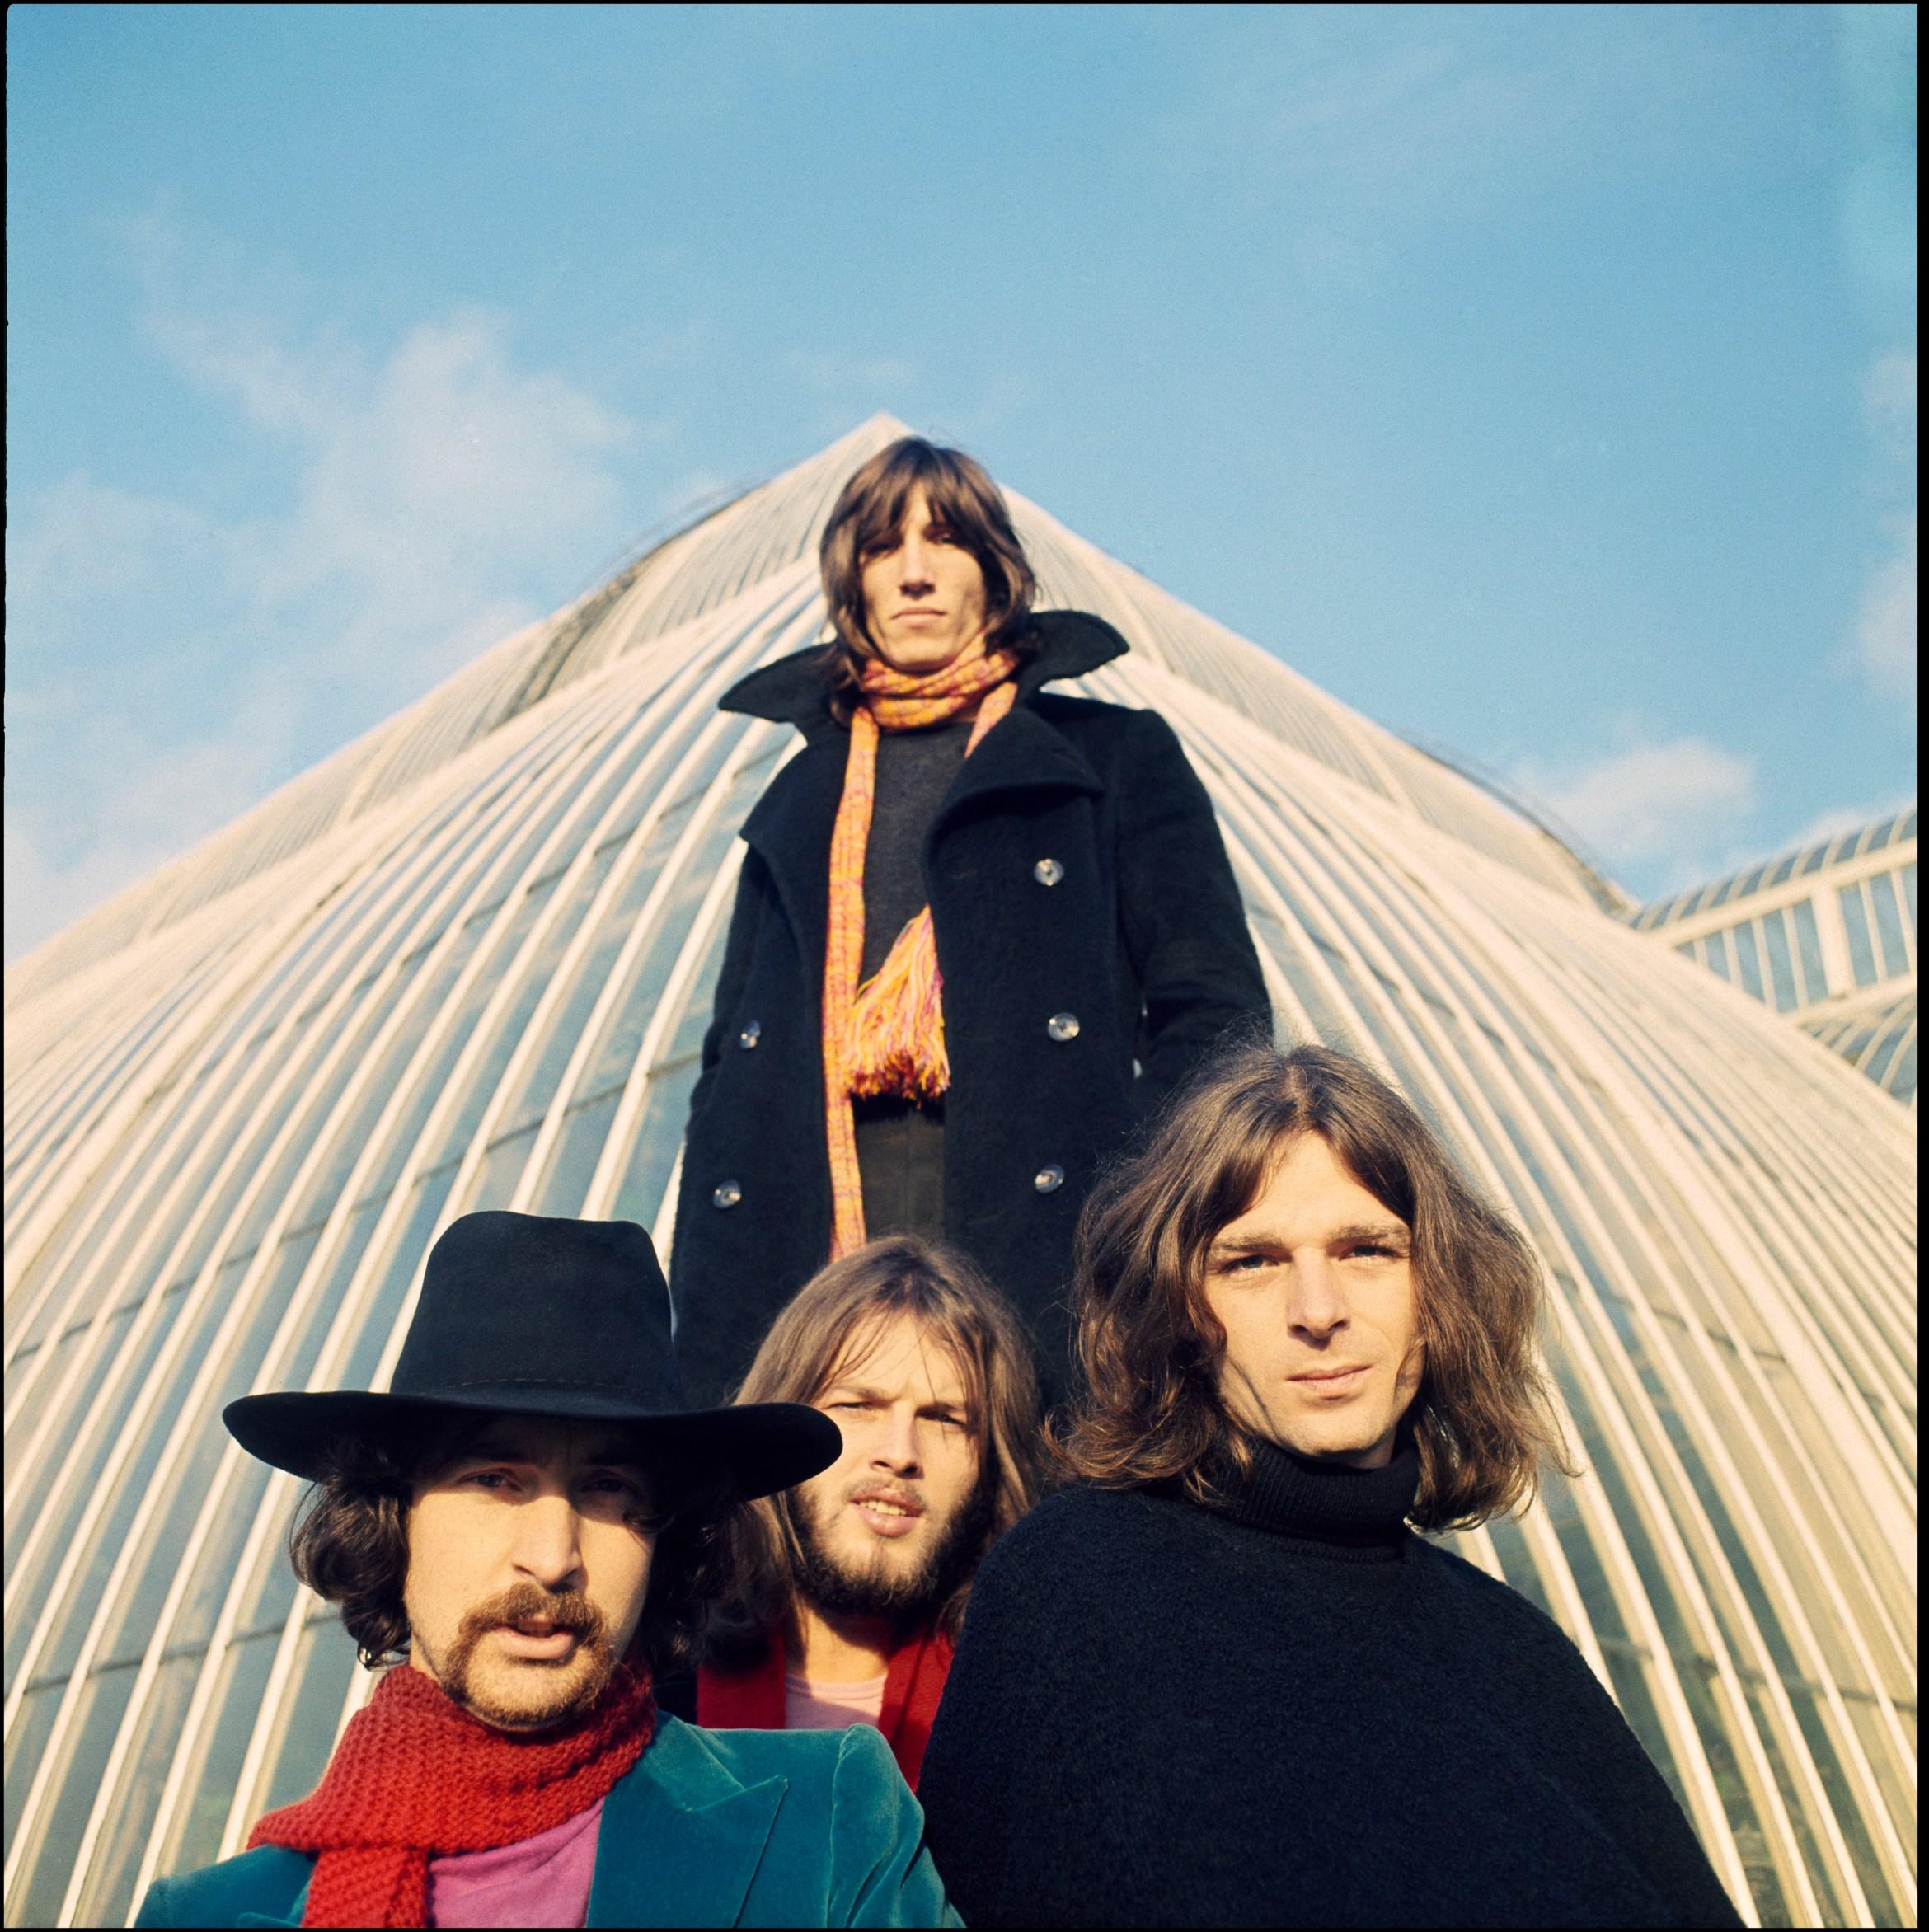 3_Pink_Floyd_NPA837A-8_-Photographer_Storm_Thorgerson_-_-Pink_Floyd_Music_Ltd.jpg